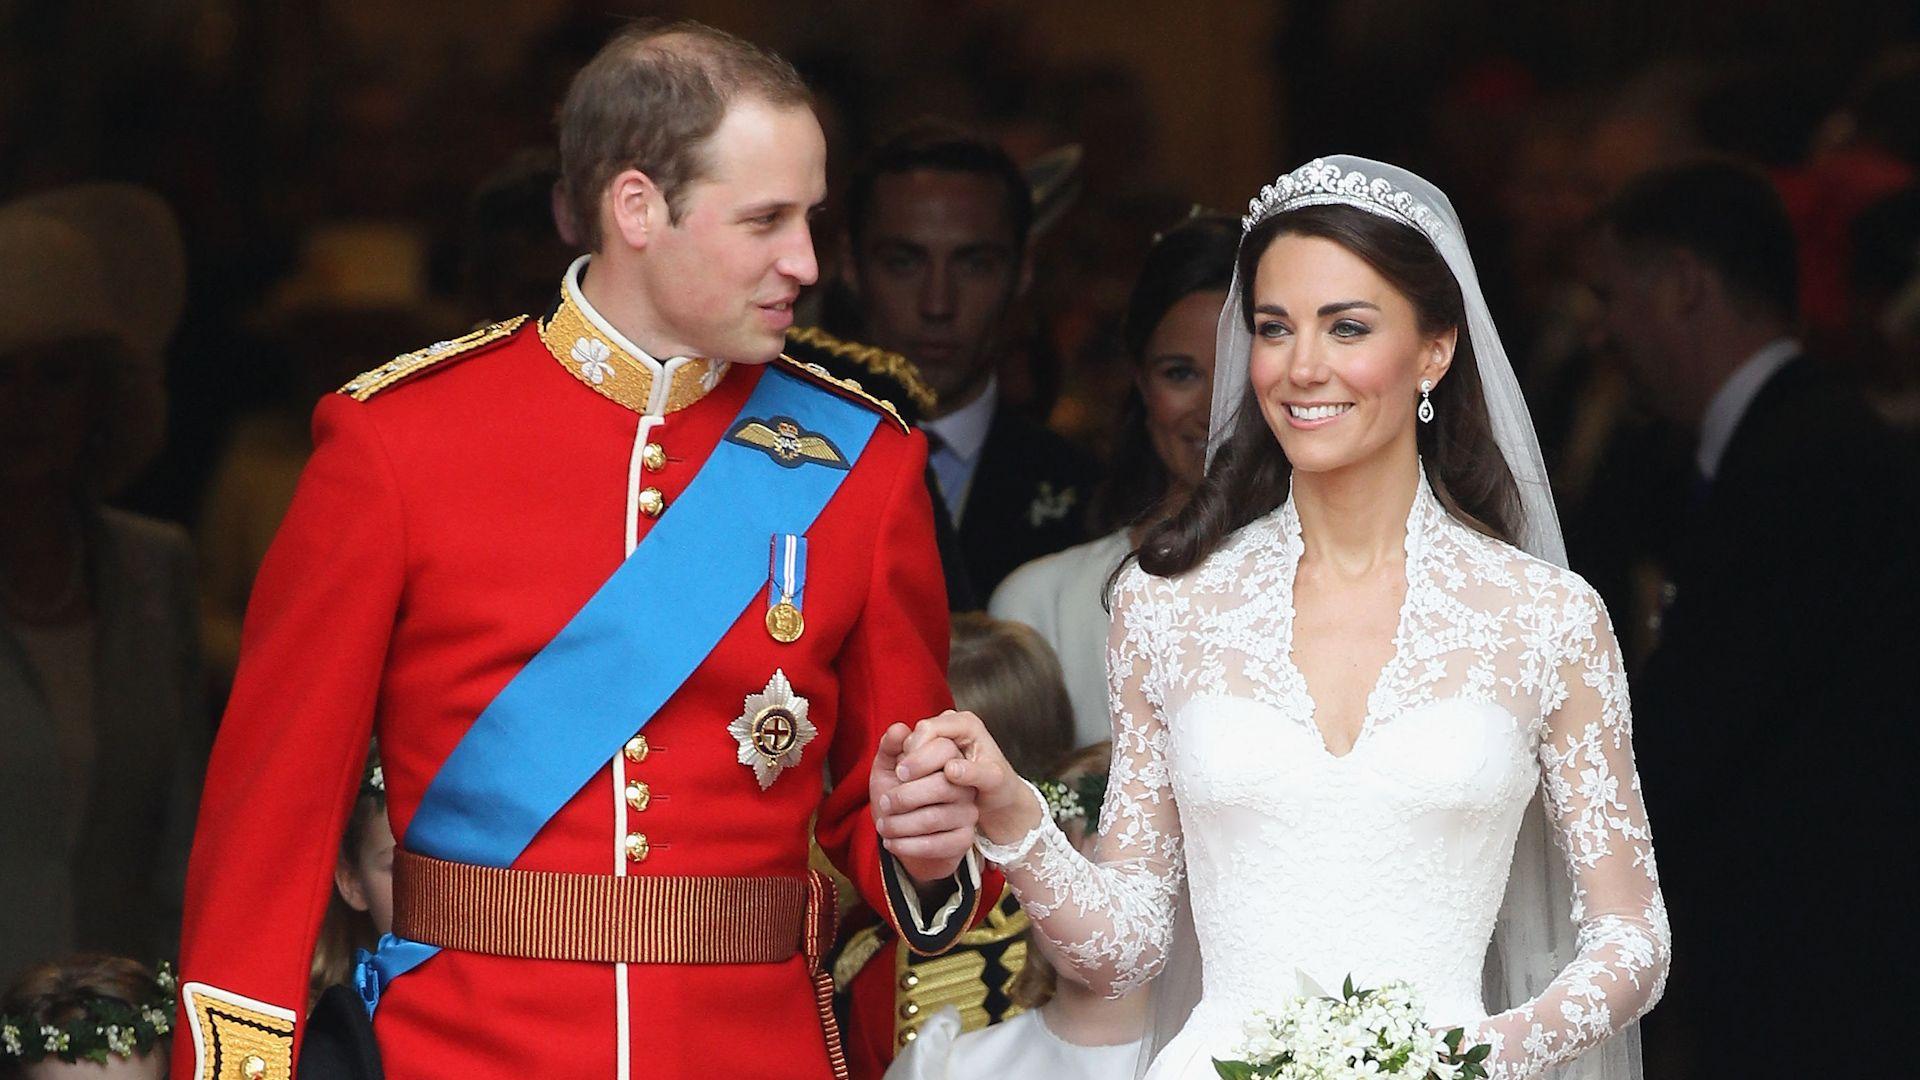 Princess Beatrice's wedding dress - everything we know so far